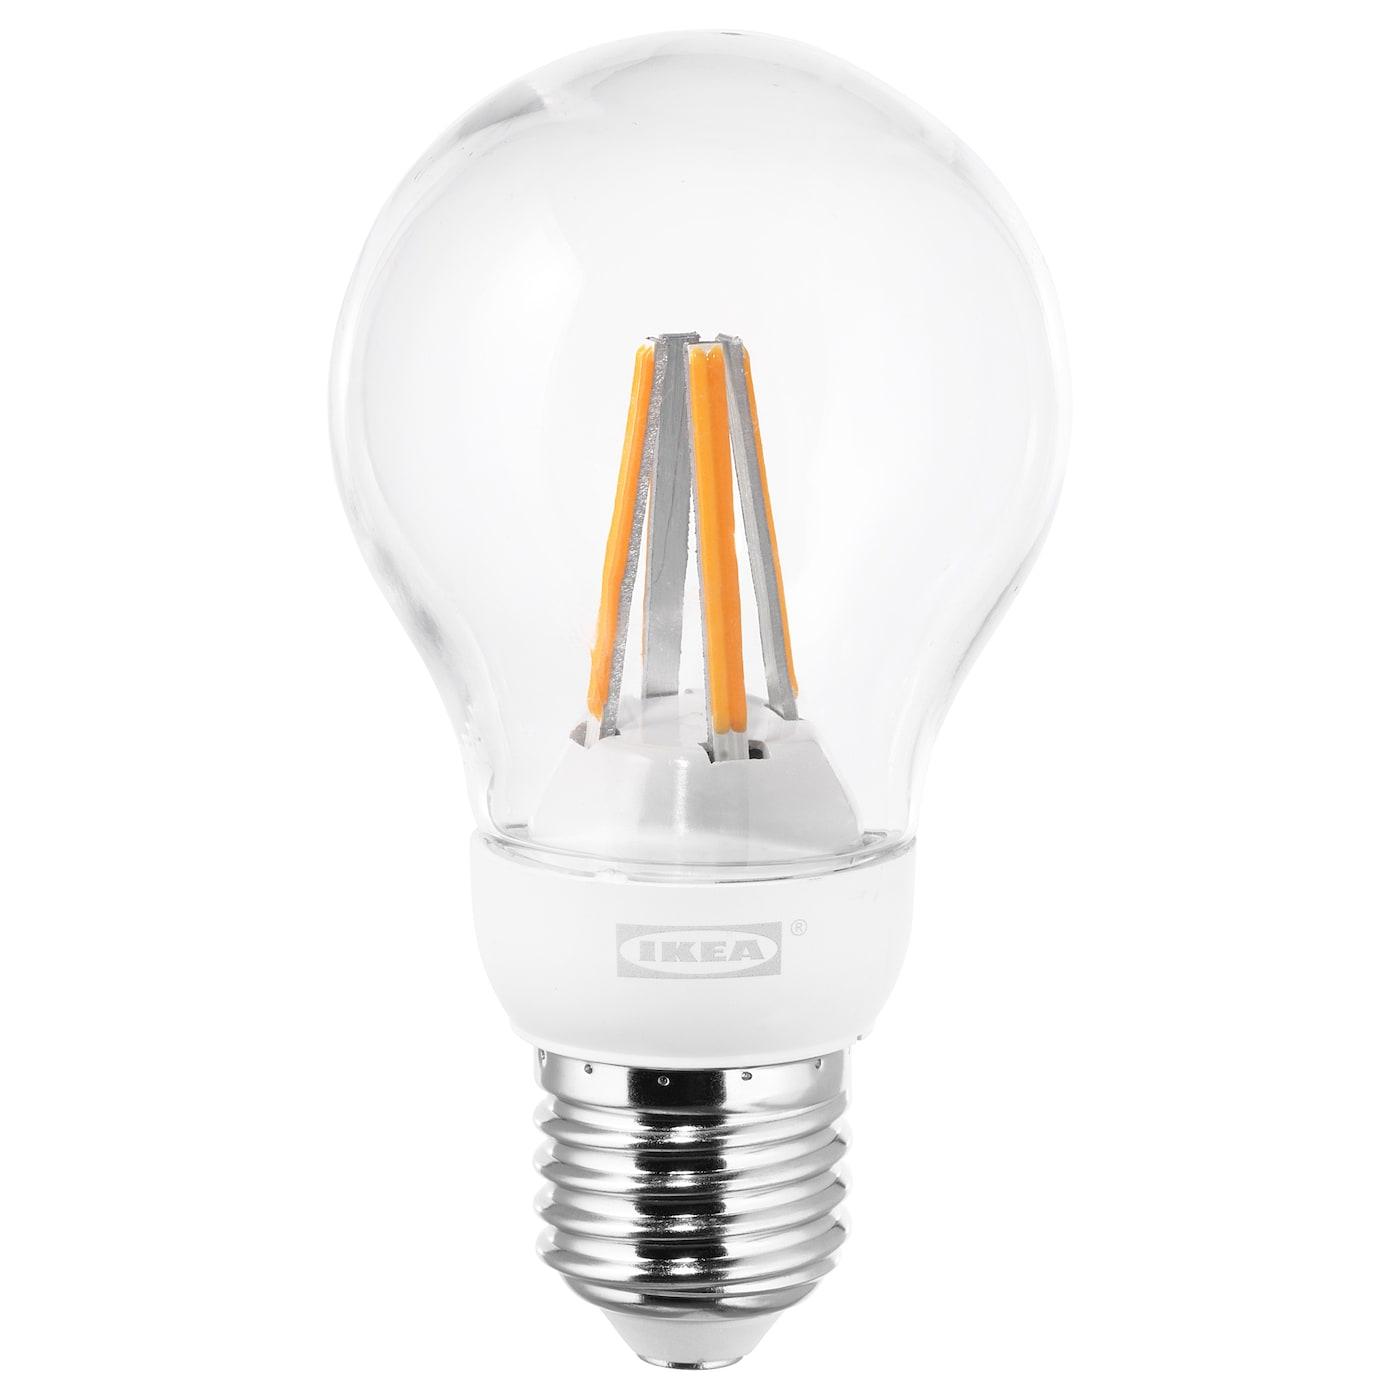 Tolle Ikea Led Lampen E27 Fotos - Hauptinnenideen - kakados.com